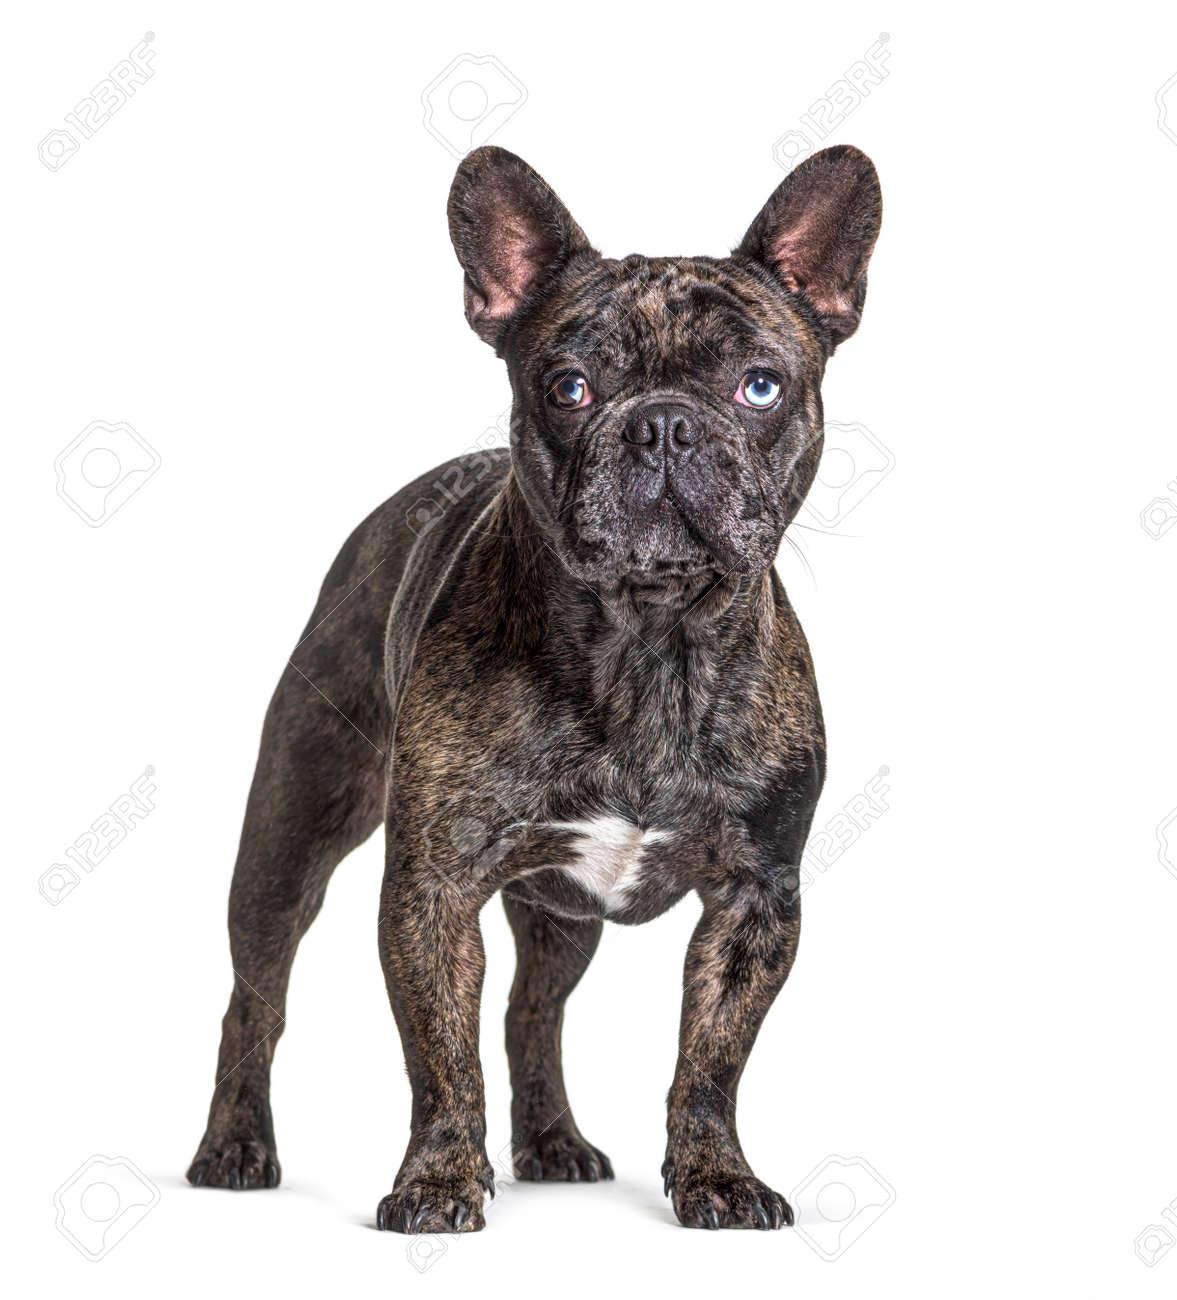 Brindle French bulldog blue eyed, standing, isolated on white - 171049326